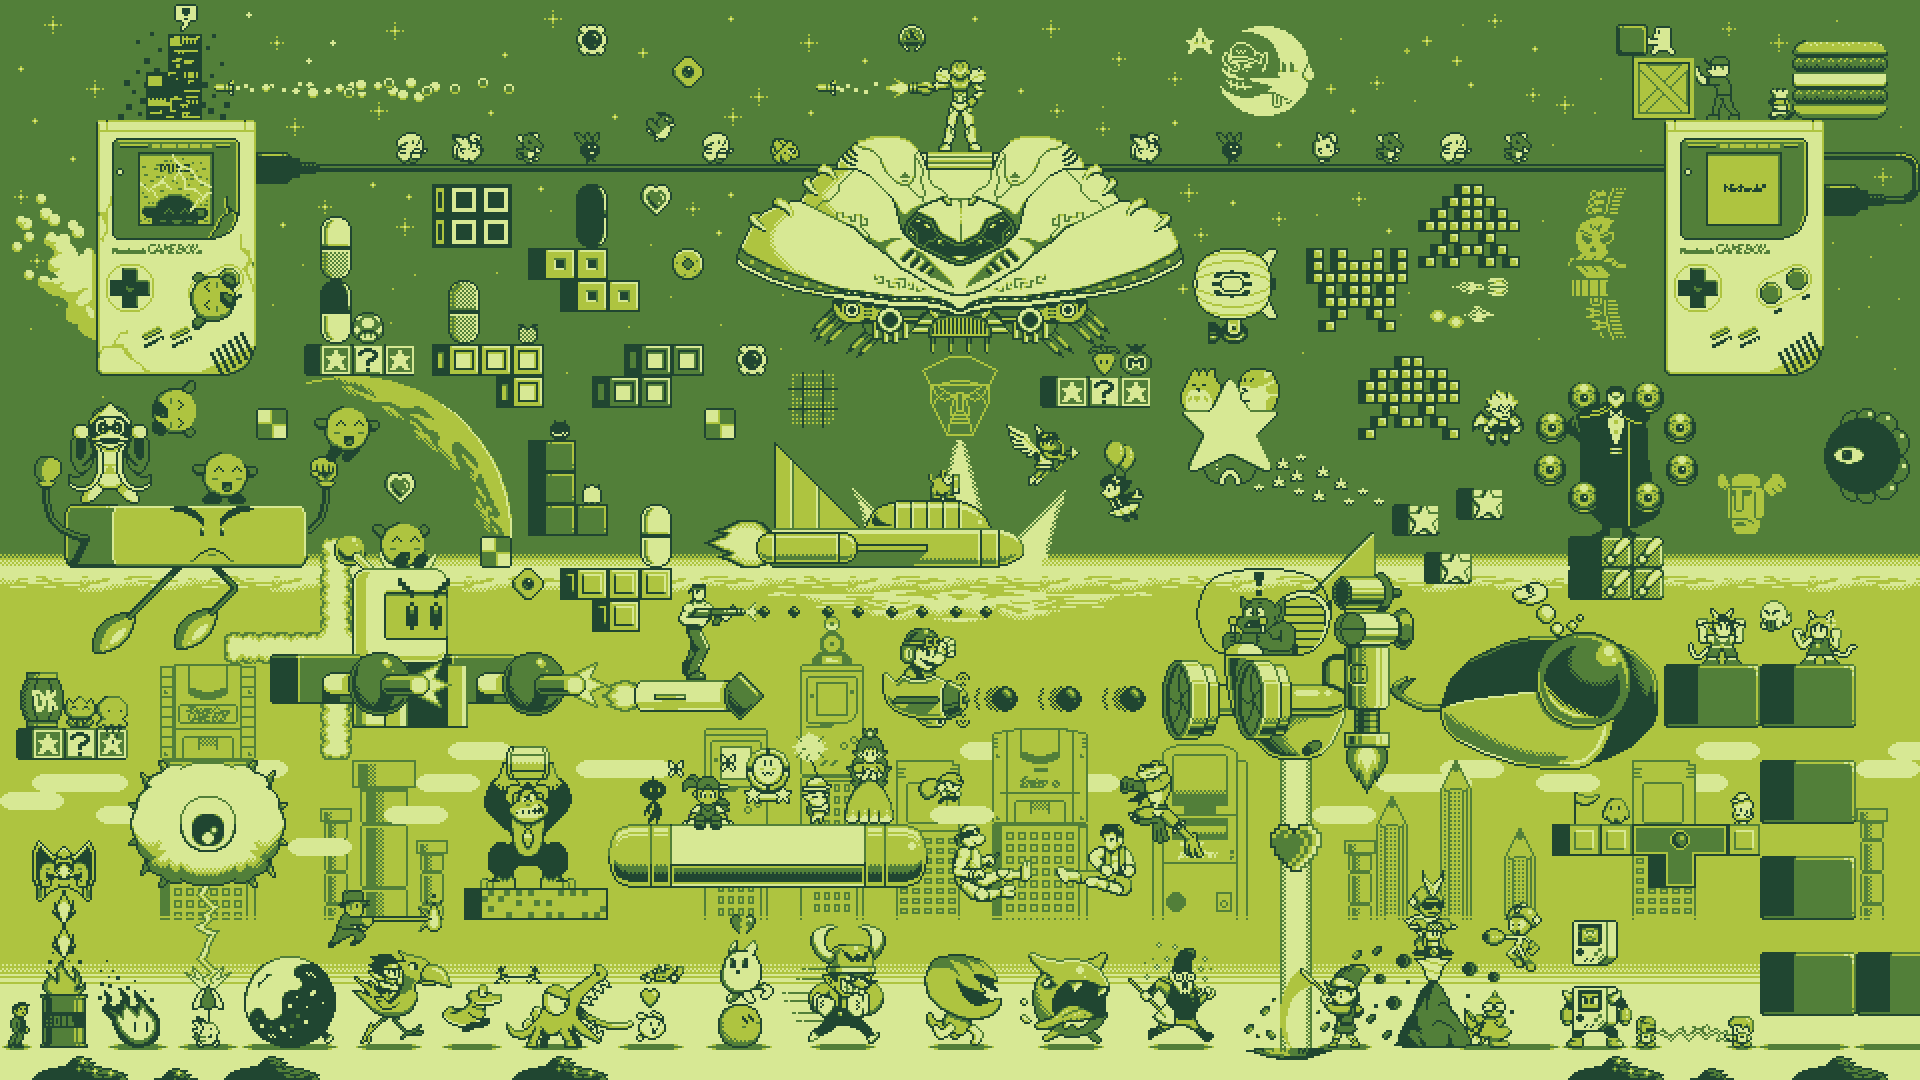 Game Boy 30th anniversary